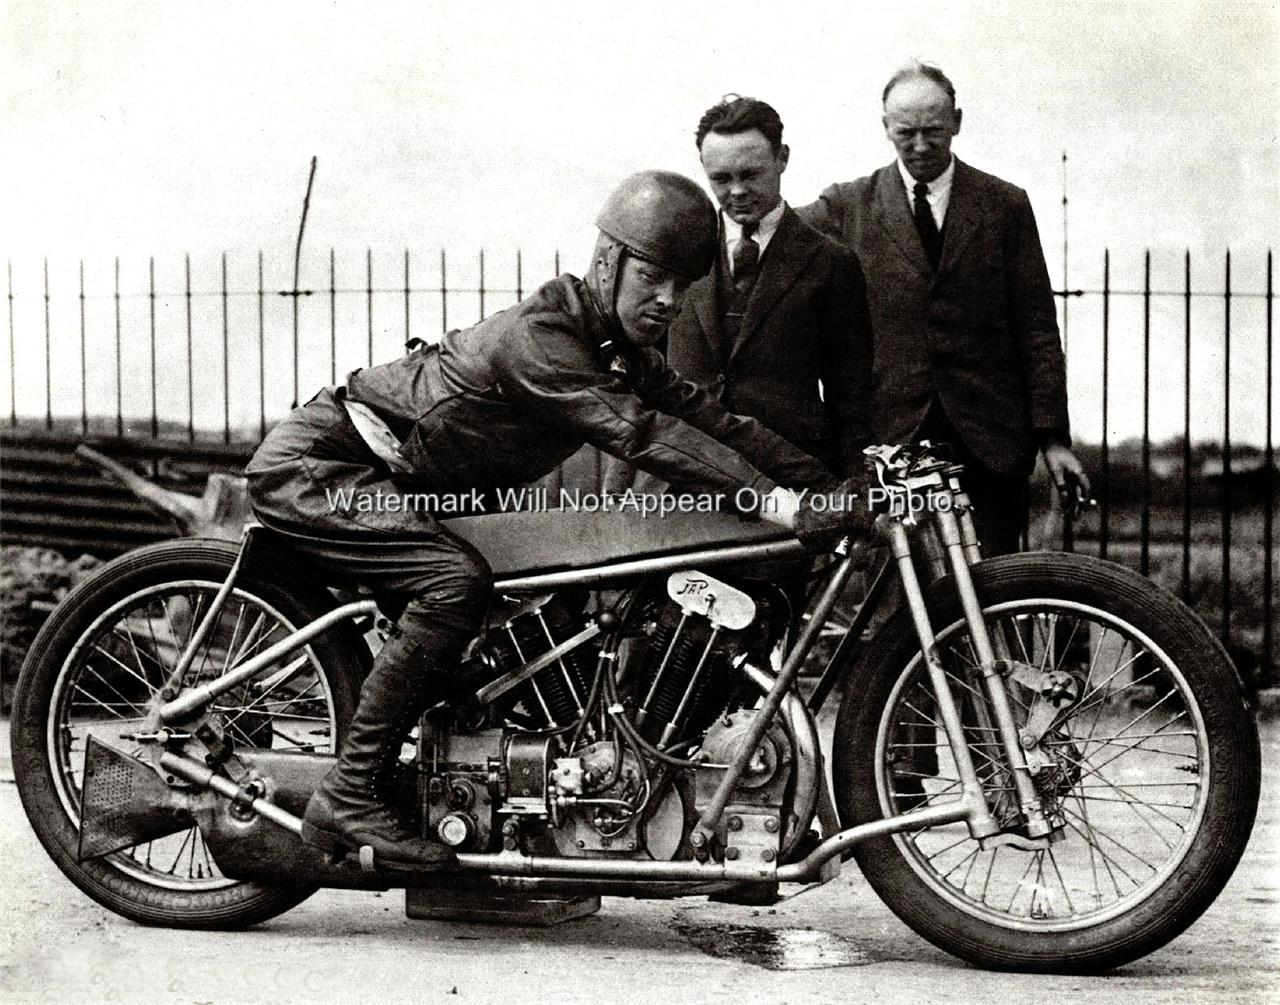 Rare J A P Motorcycle British United Kingdom V Twin